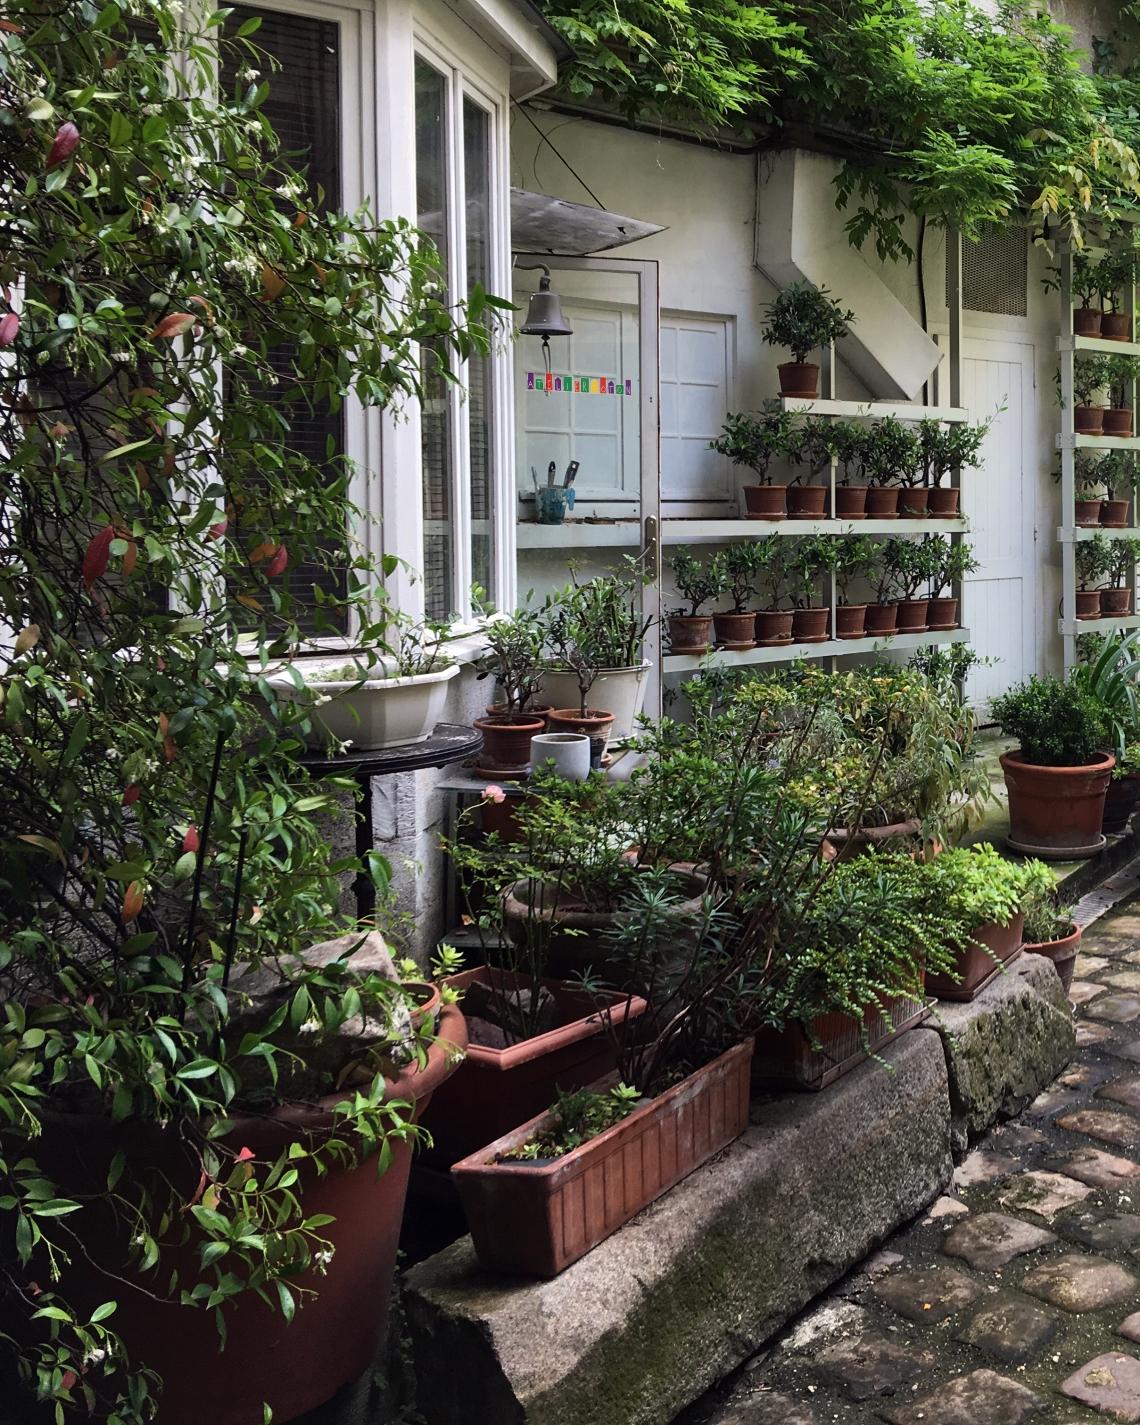 ipogeo giardino